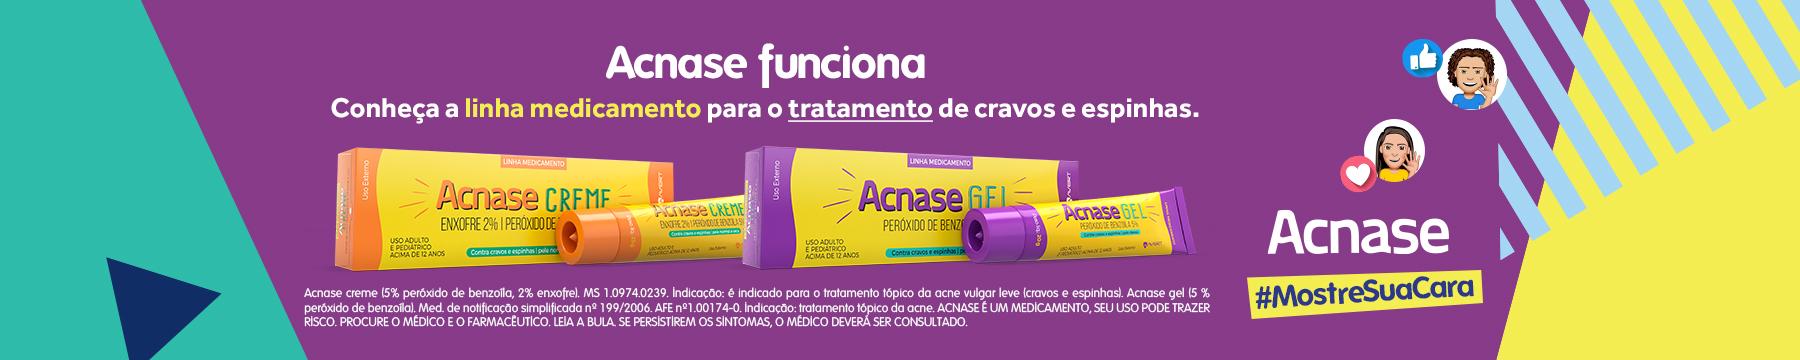 3c661501463ac1f7924affb061eb86690e35f92b36053   banner site consulta remedios header 1800x360 ok